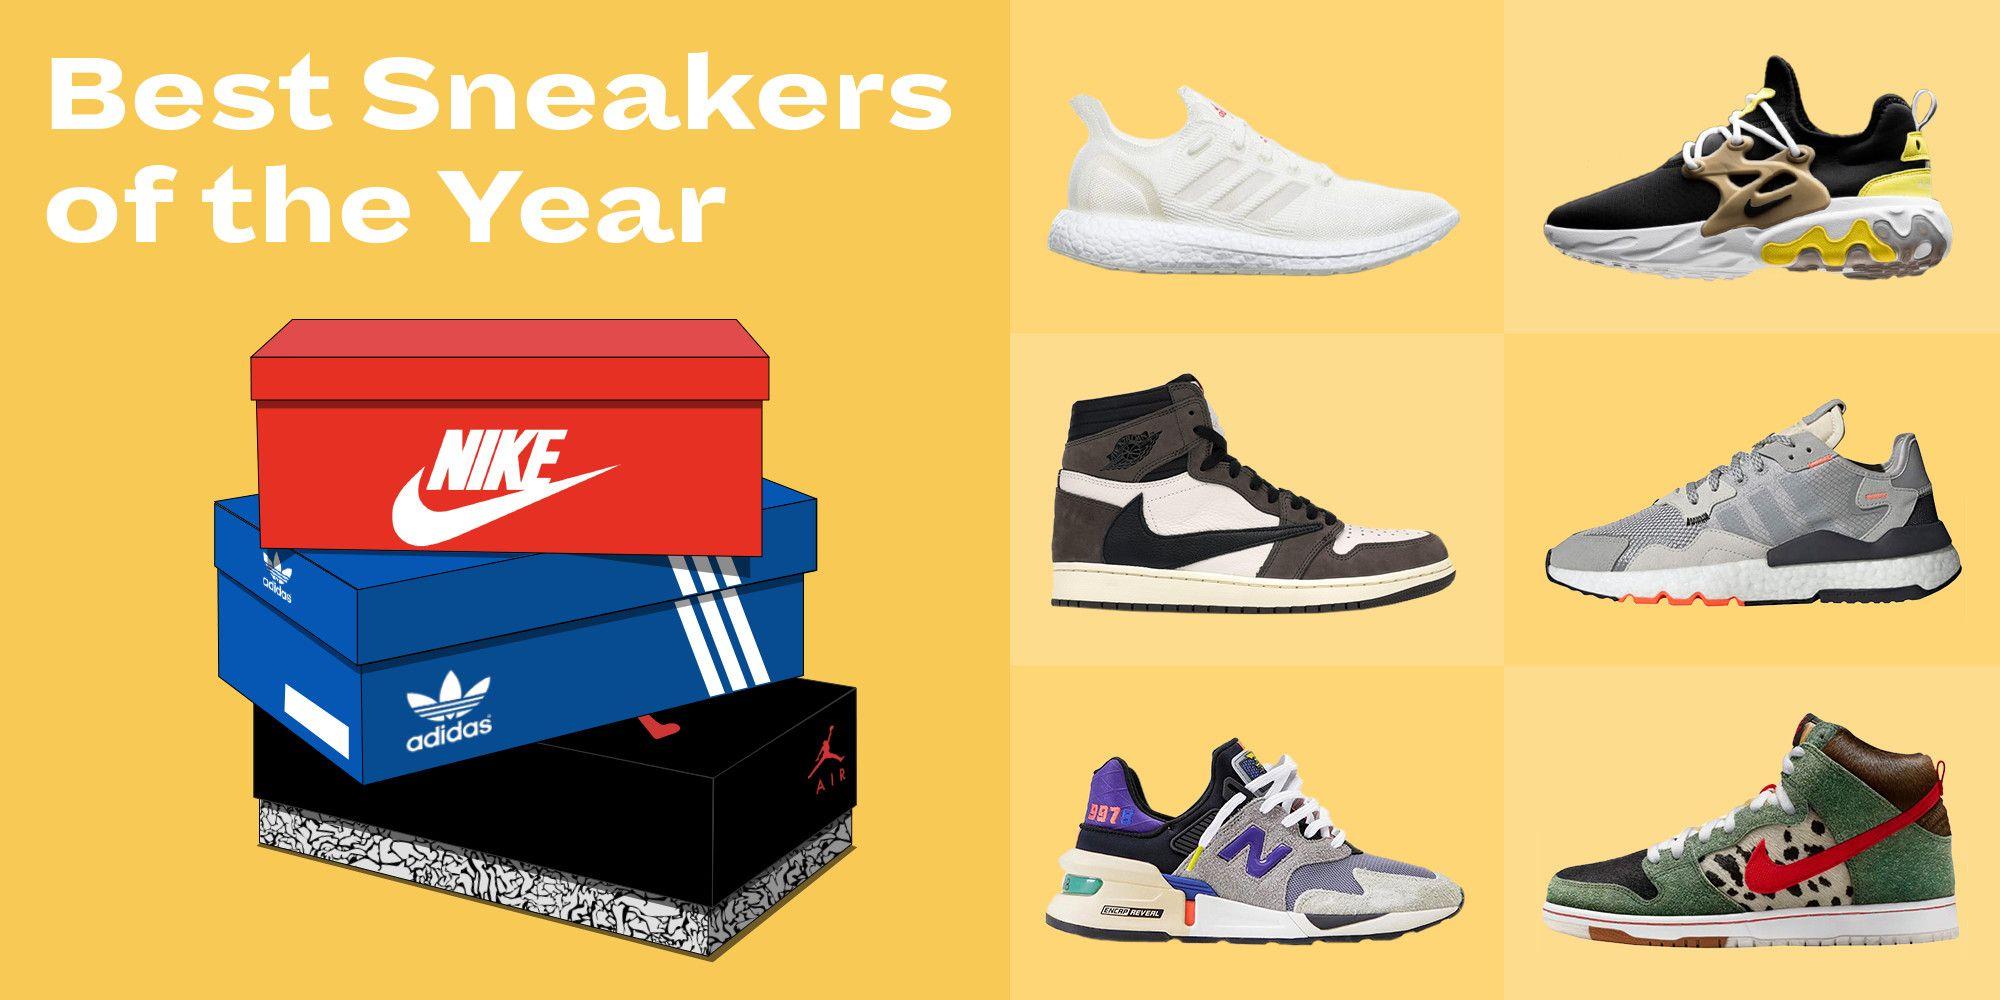 sneaker giveaway july 2019